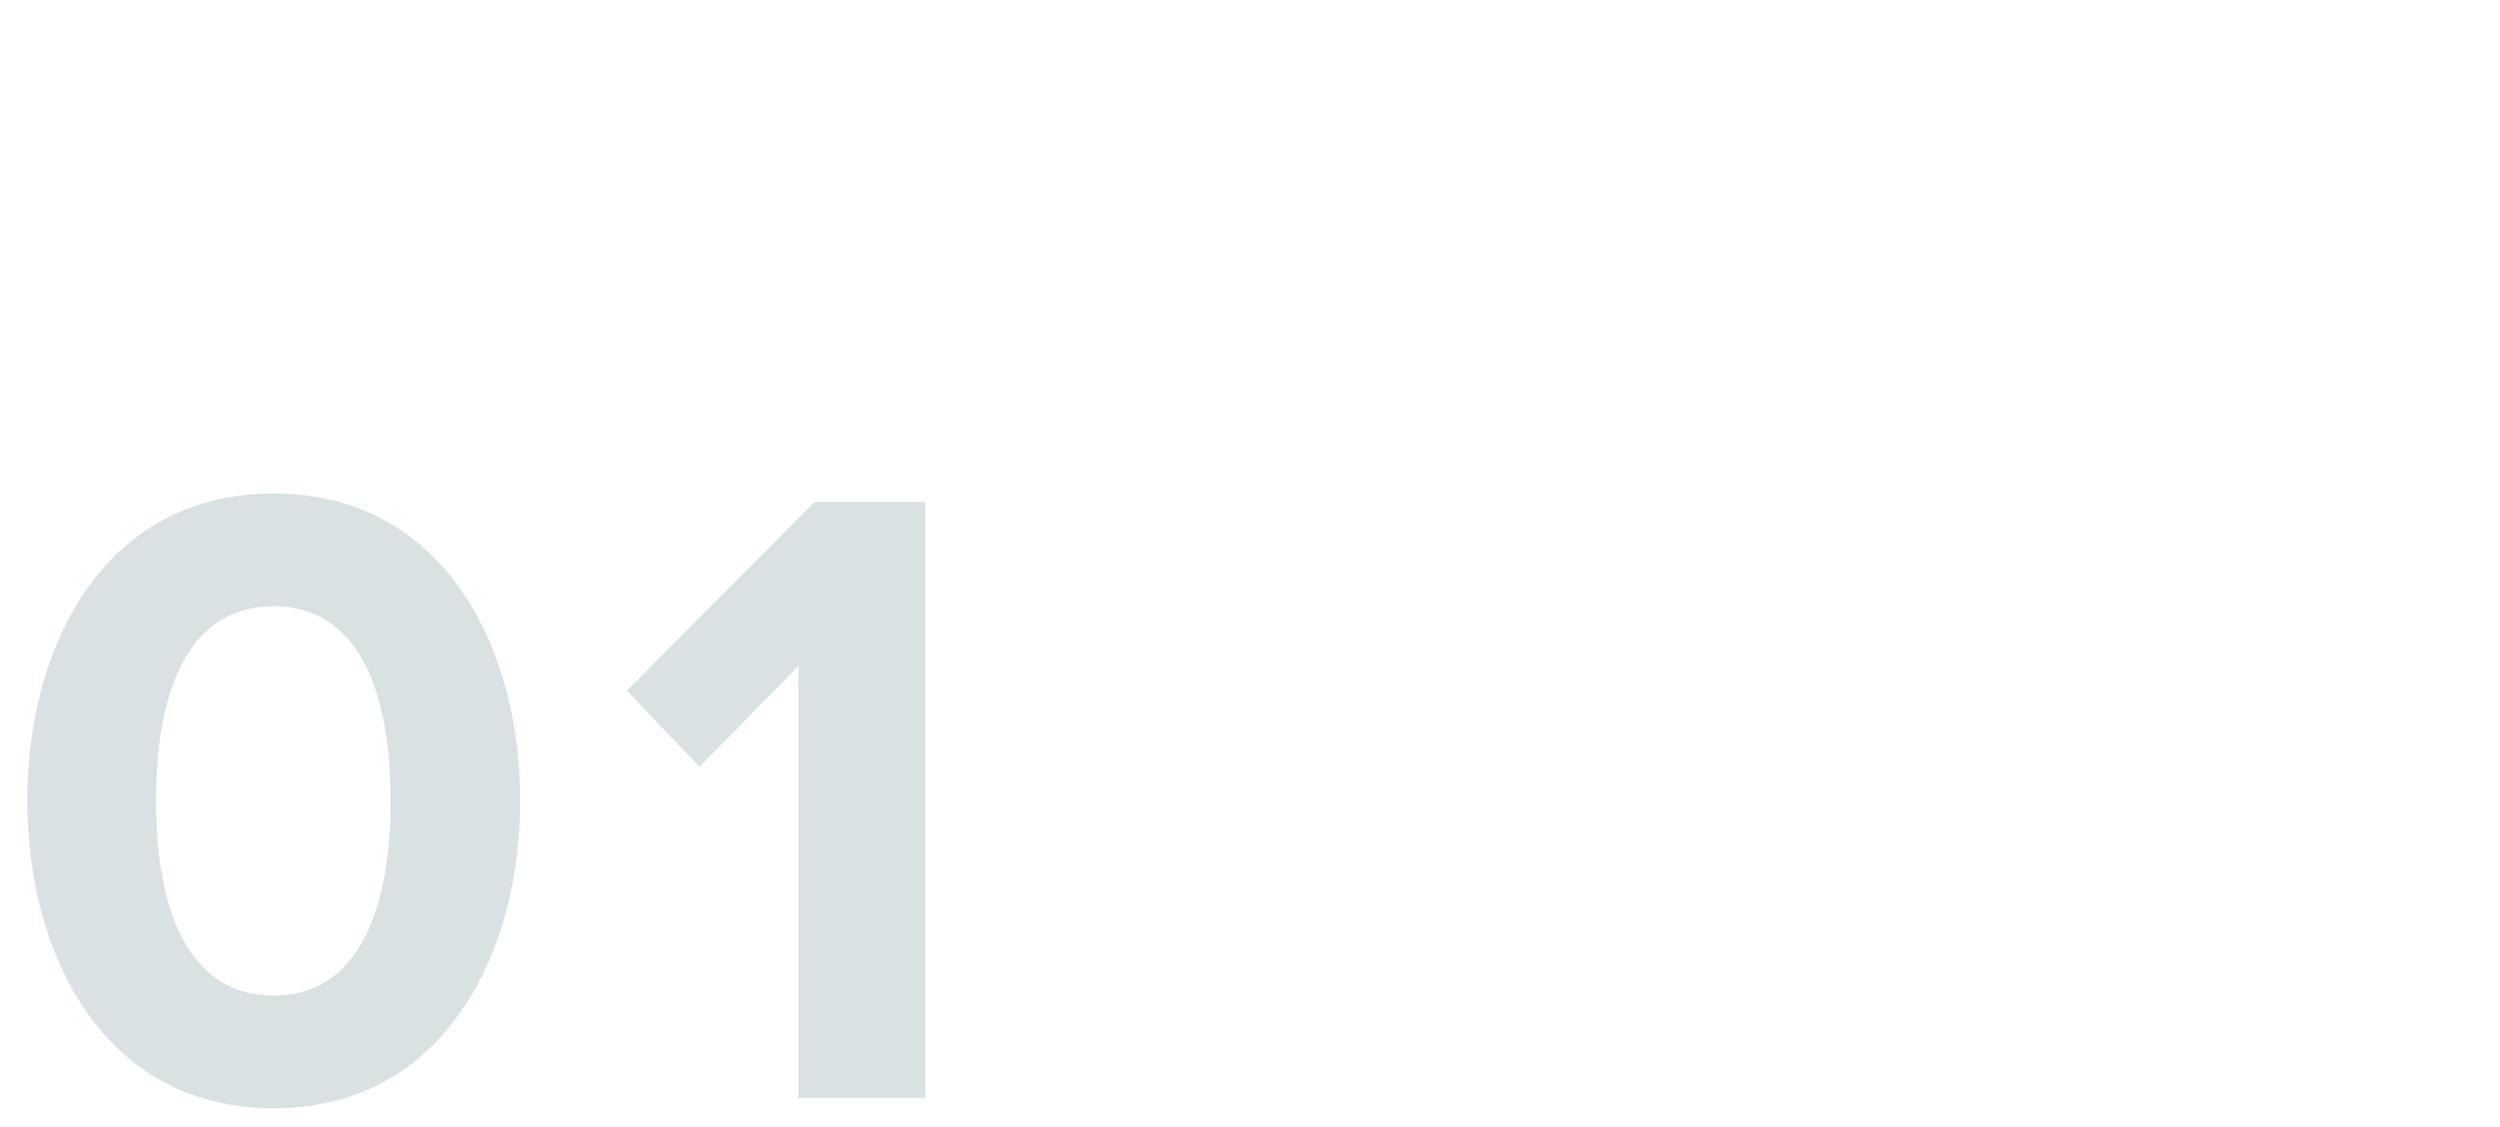 Website Numbers-01.png